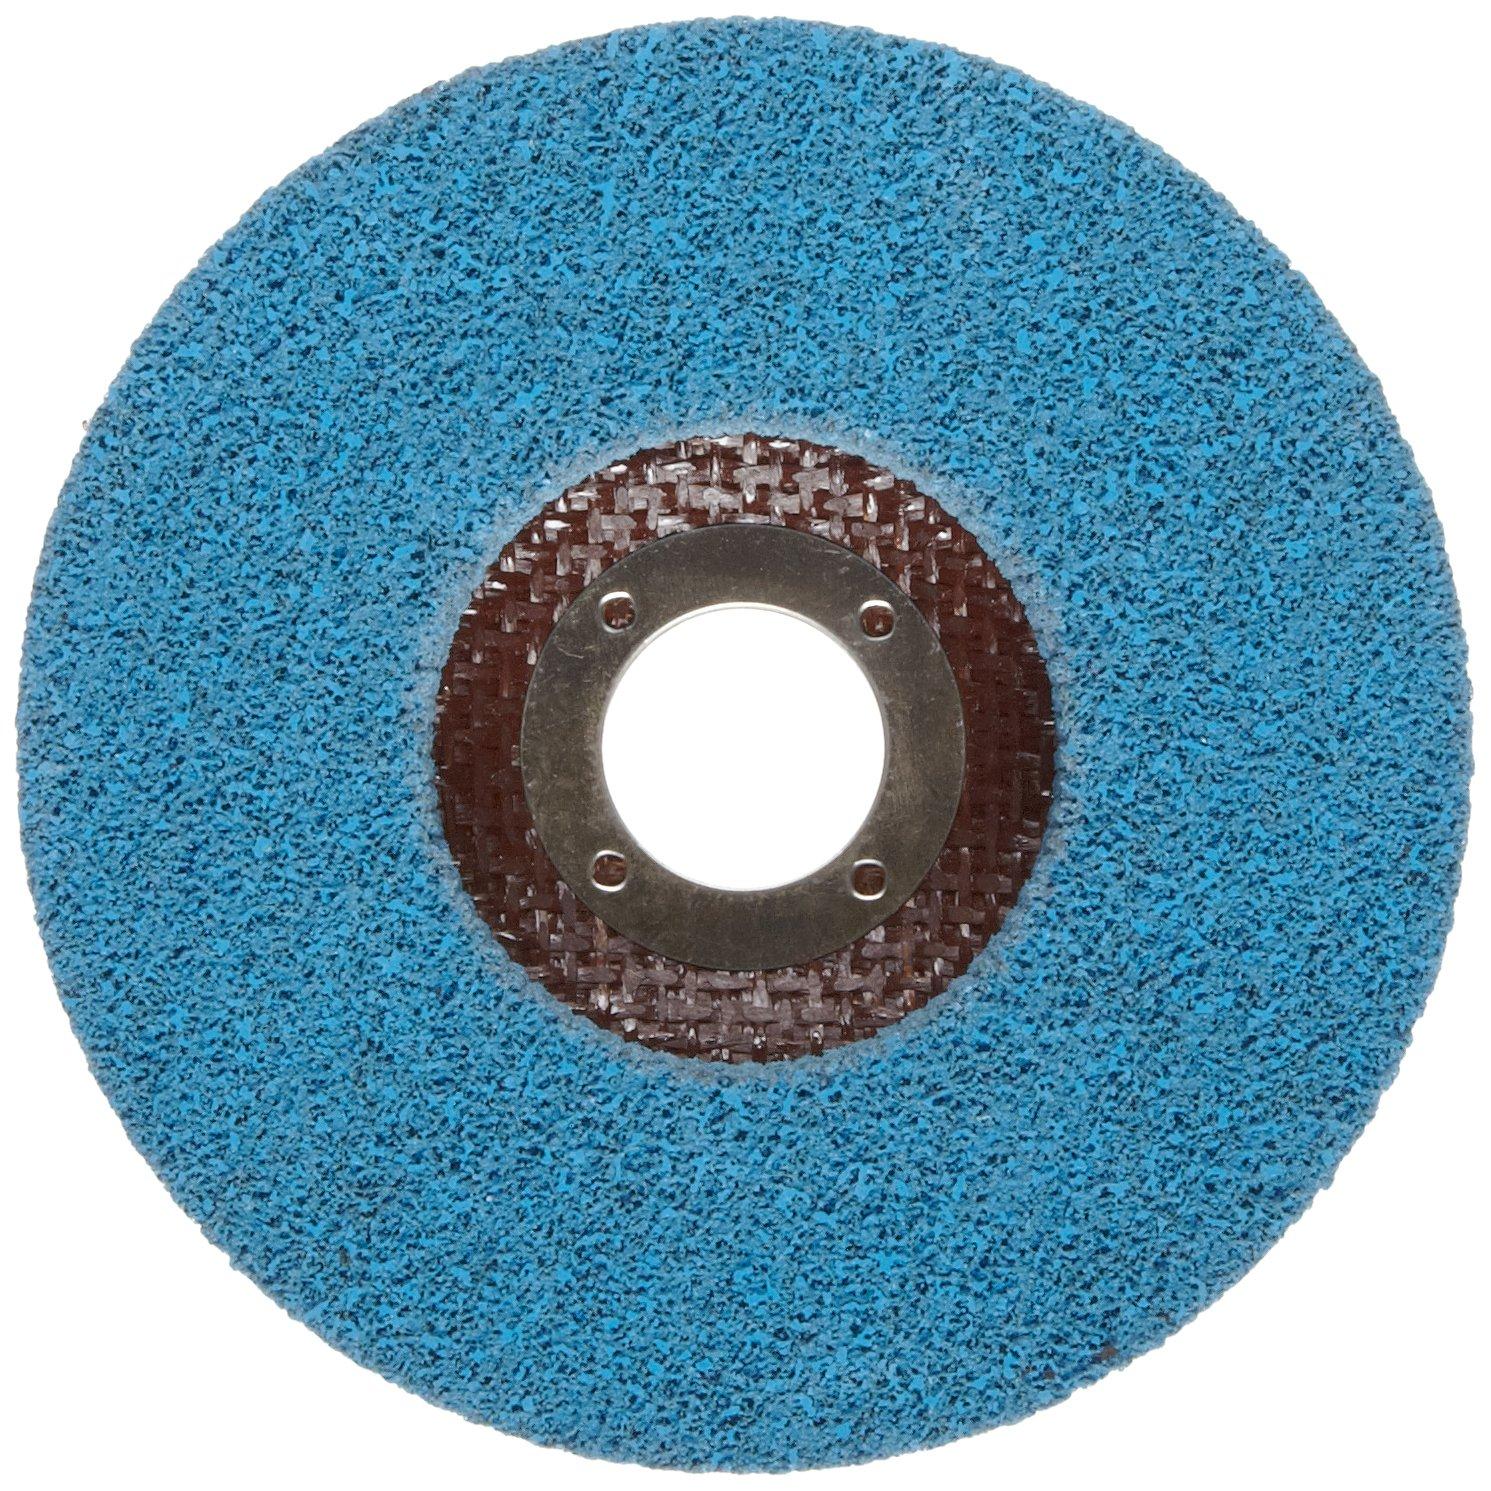 Norton Bear-Tex Depressed Center Vortex Rapid Finish Unified Nonwoven Abrasive Wheel, Type 27, 4-1/2'' Diameter, 7/8'' Arbor, Grit 5AM (Pack of 10)